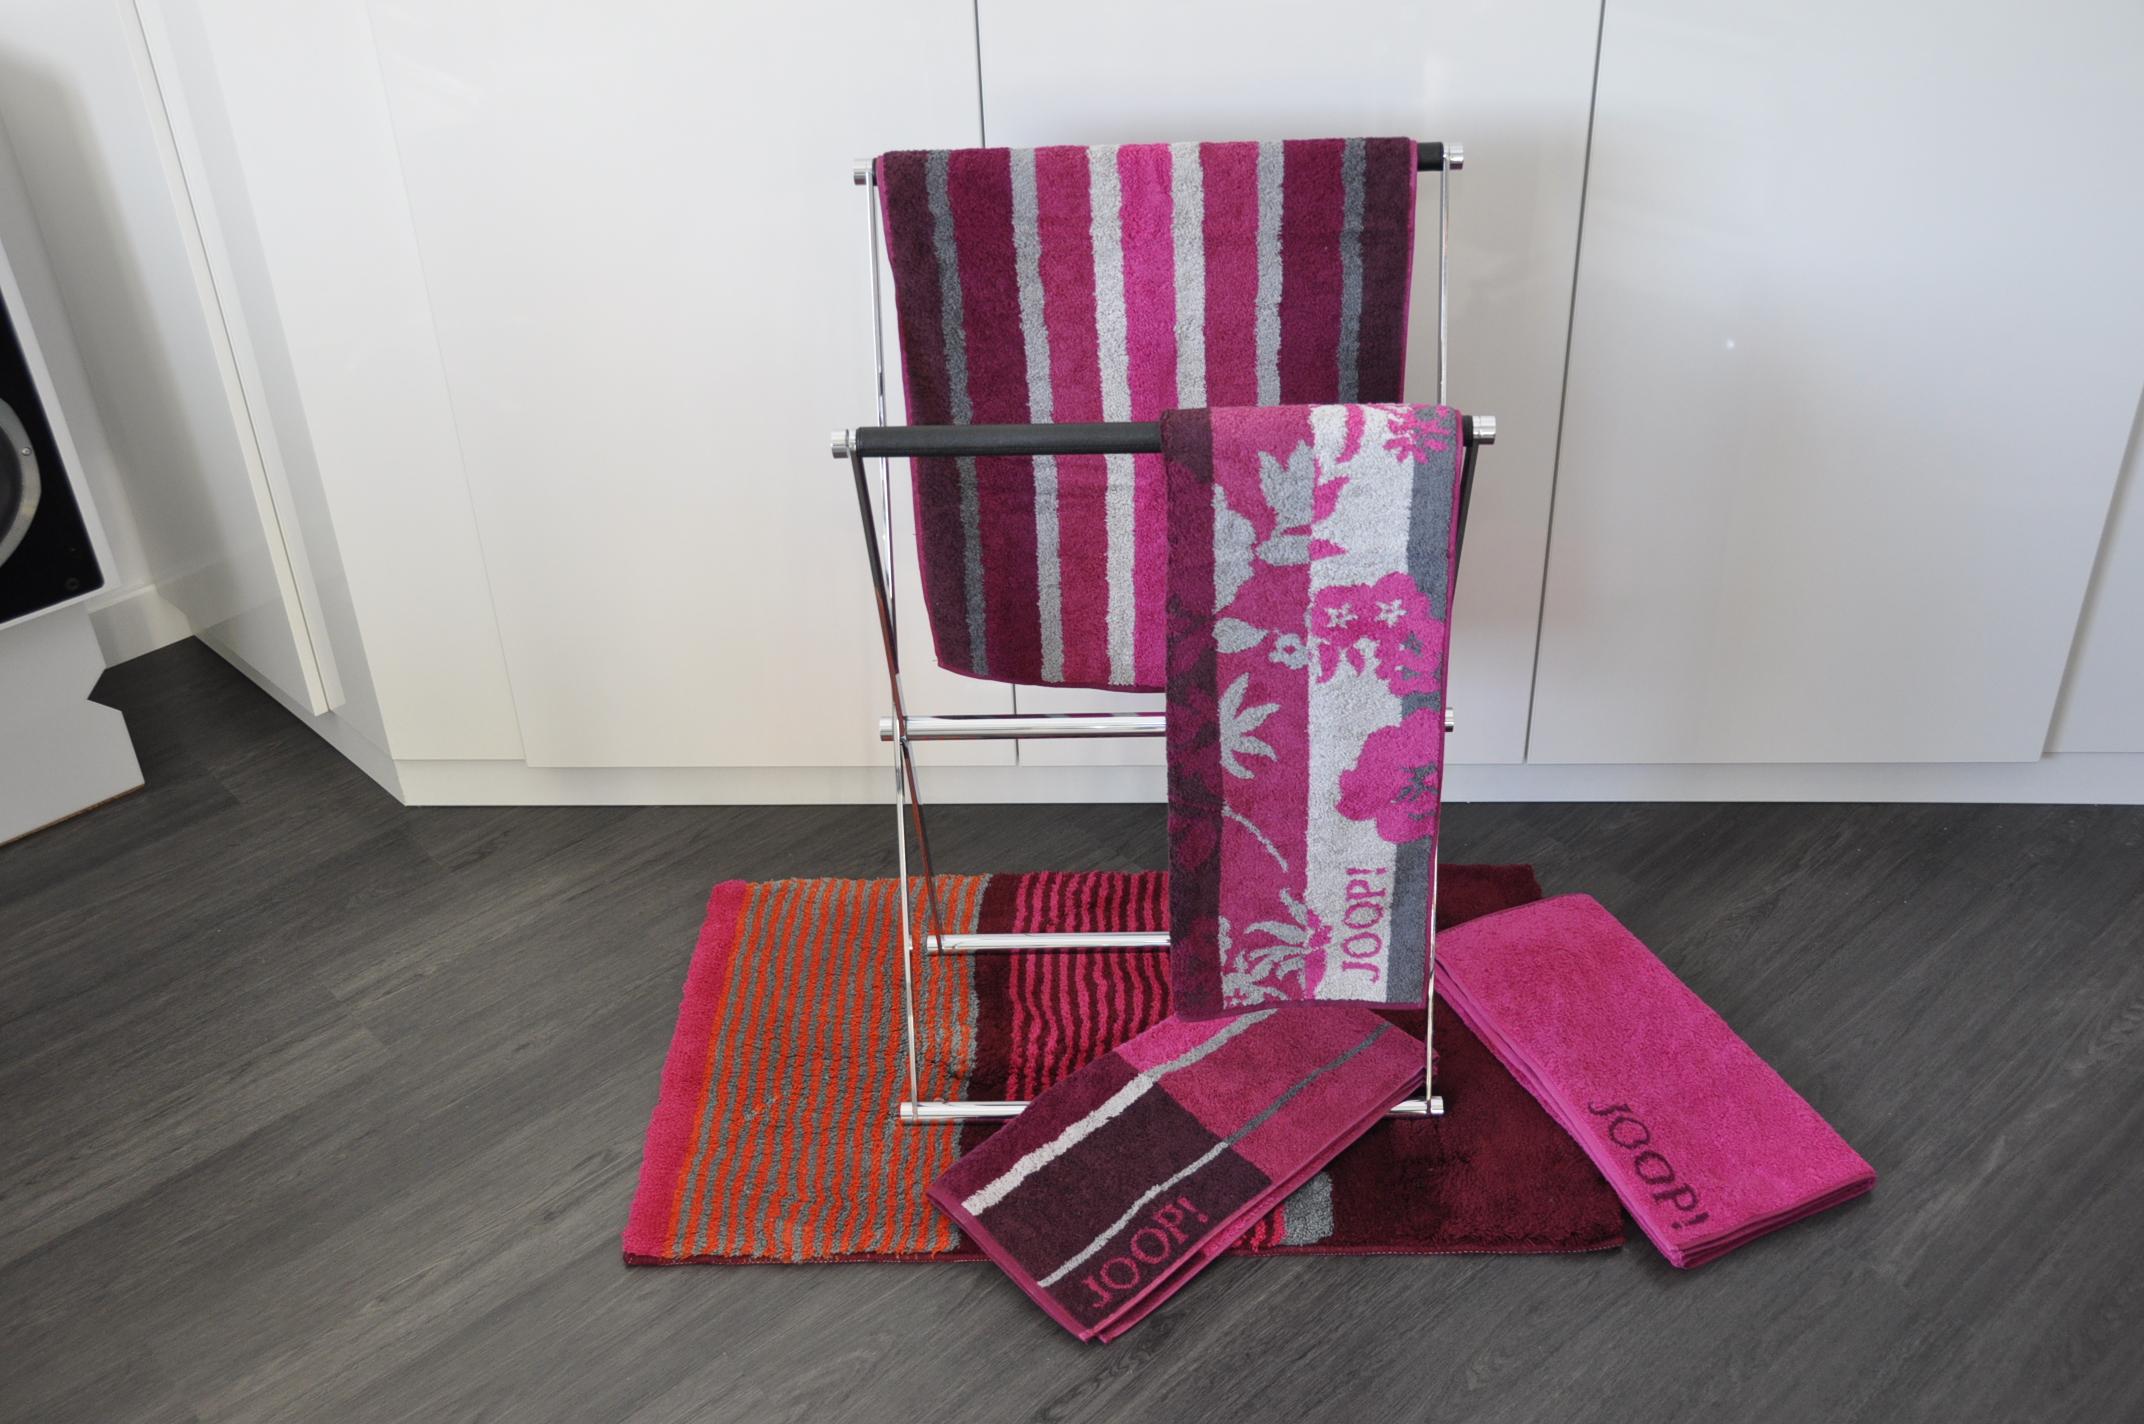 joop shades handtuch duschtuch saunatuch g stetuch top ebay. Black Bedroom Furniture Sets. Home Design Ideas